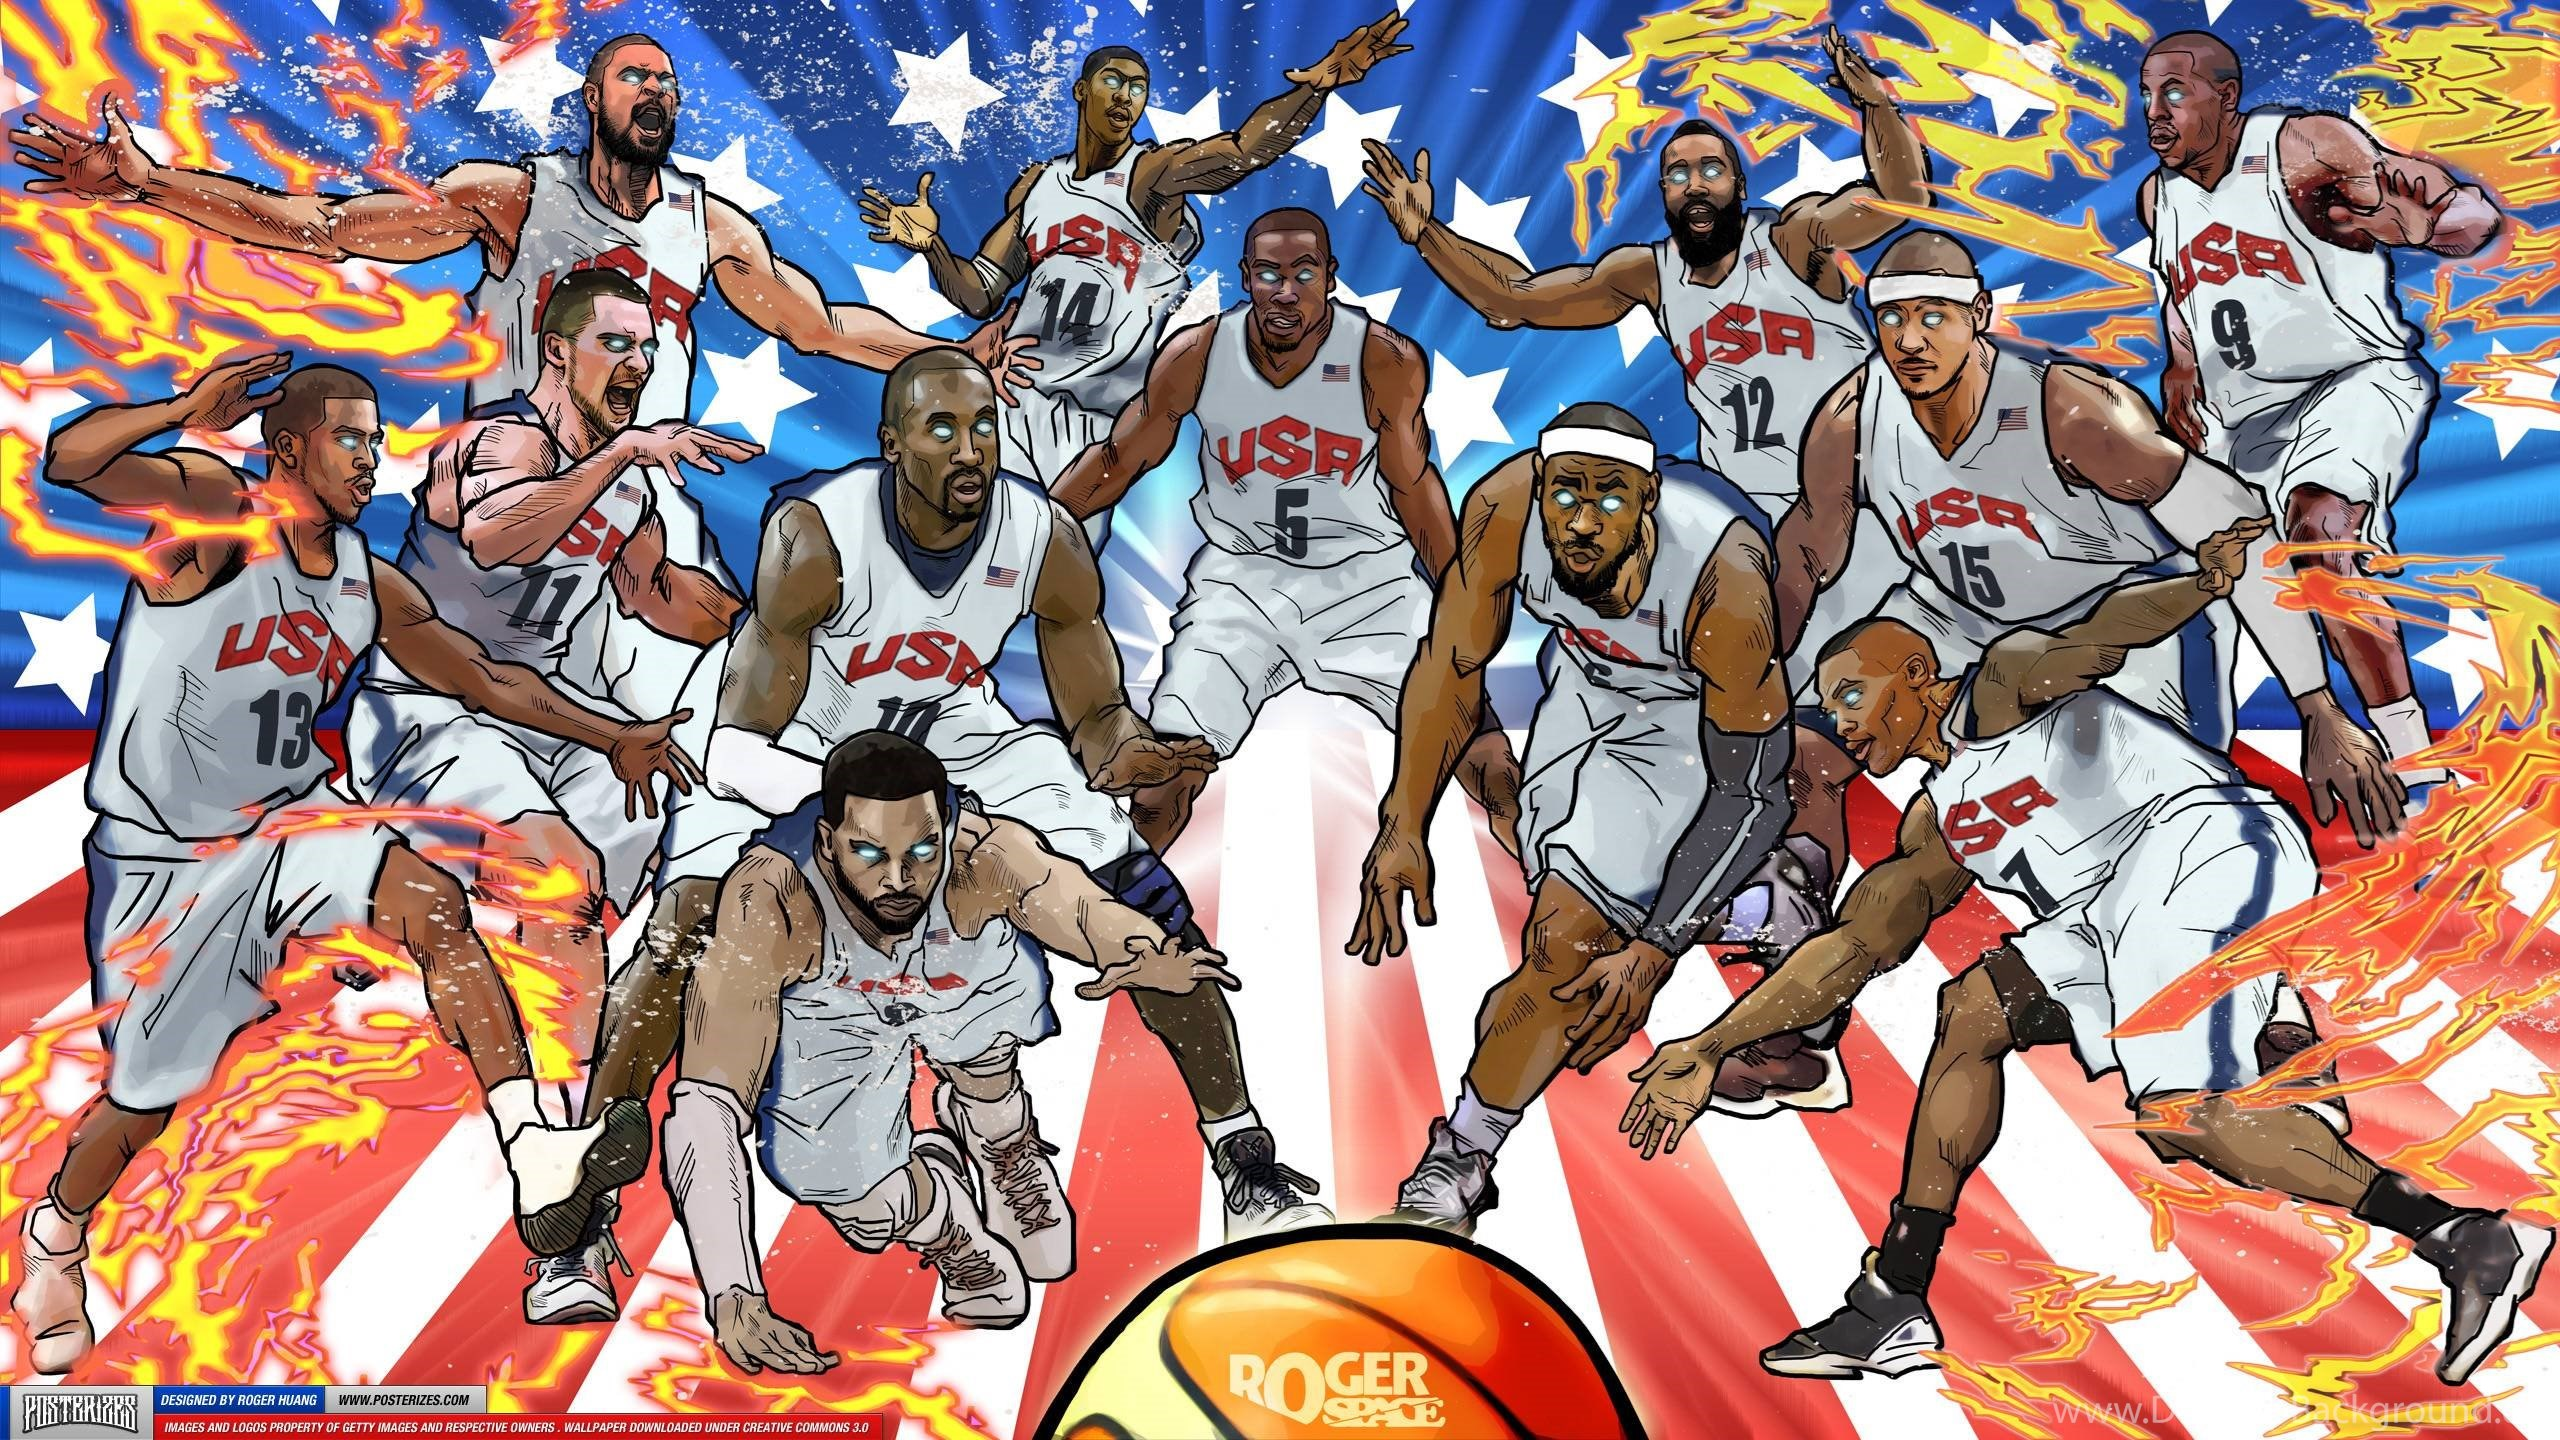 nba basketball wallpapers 2015 desktop background